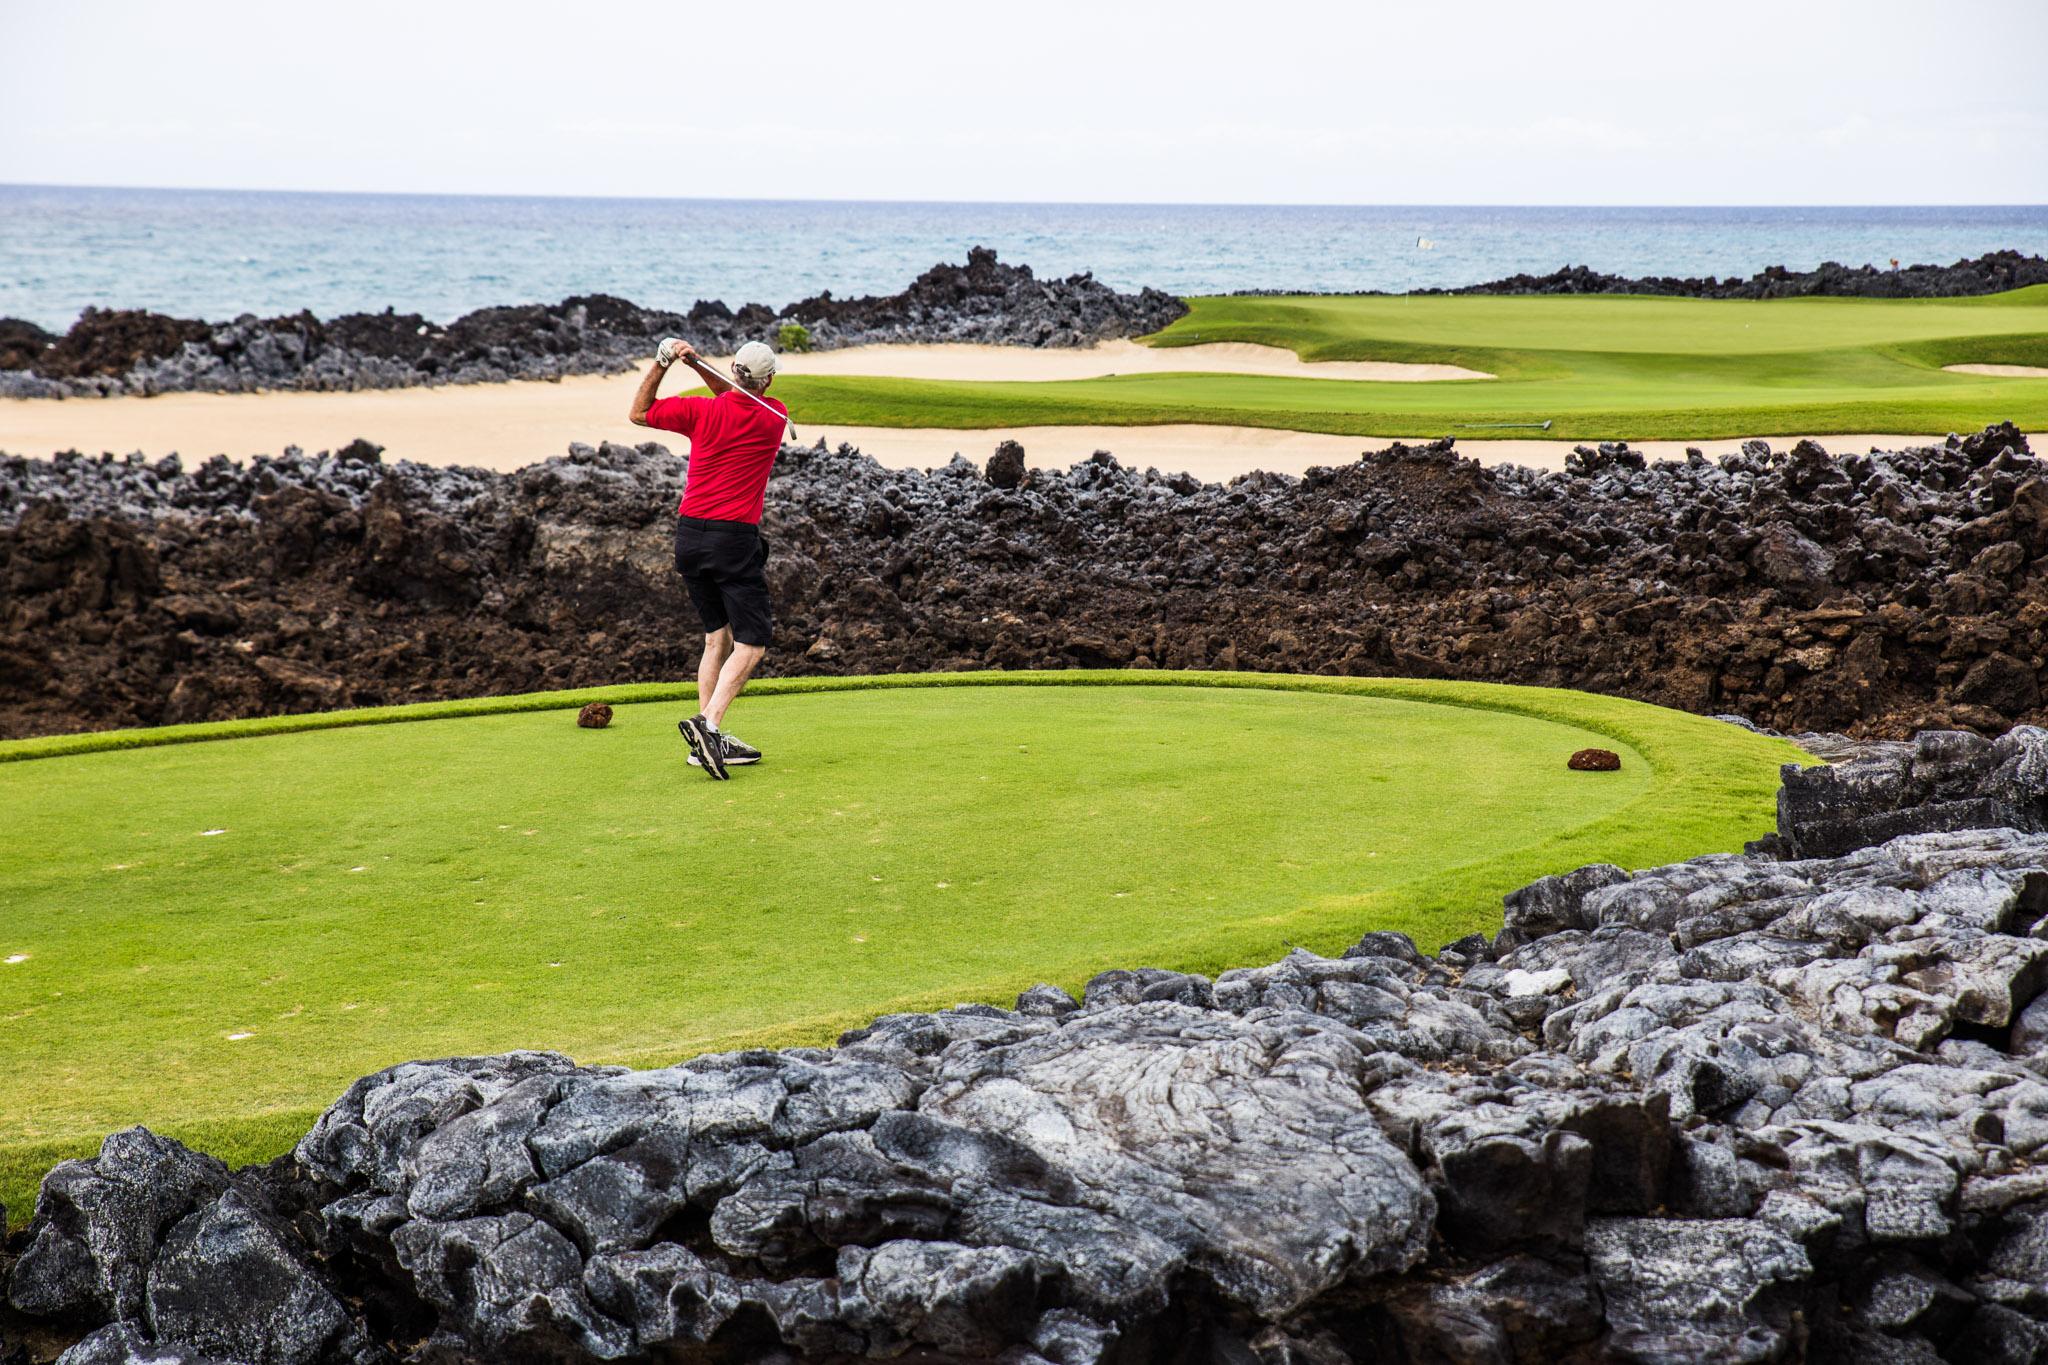 Golf course at Hualalai // A Luxury Stay on the Big Island: Four Seasons Resort Hualalai // #readysetjetset #hawaii #bigisland #luxuryhotels #beachresorts #usa #travel